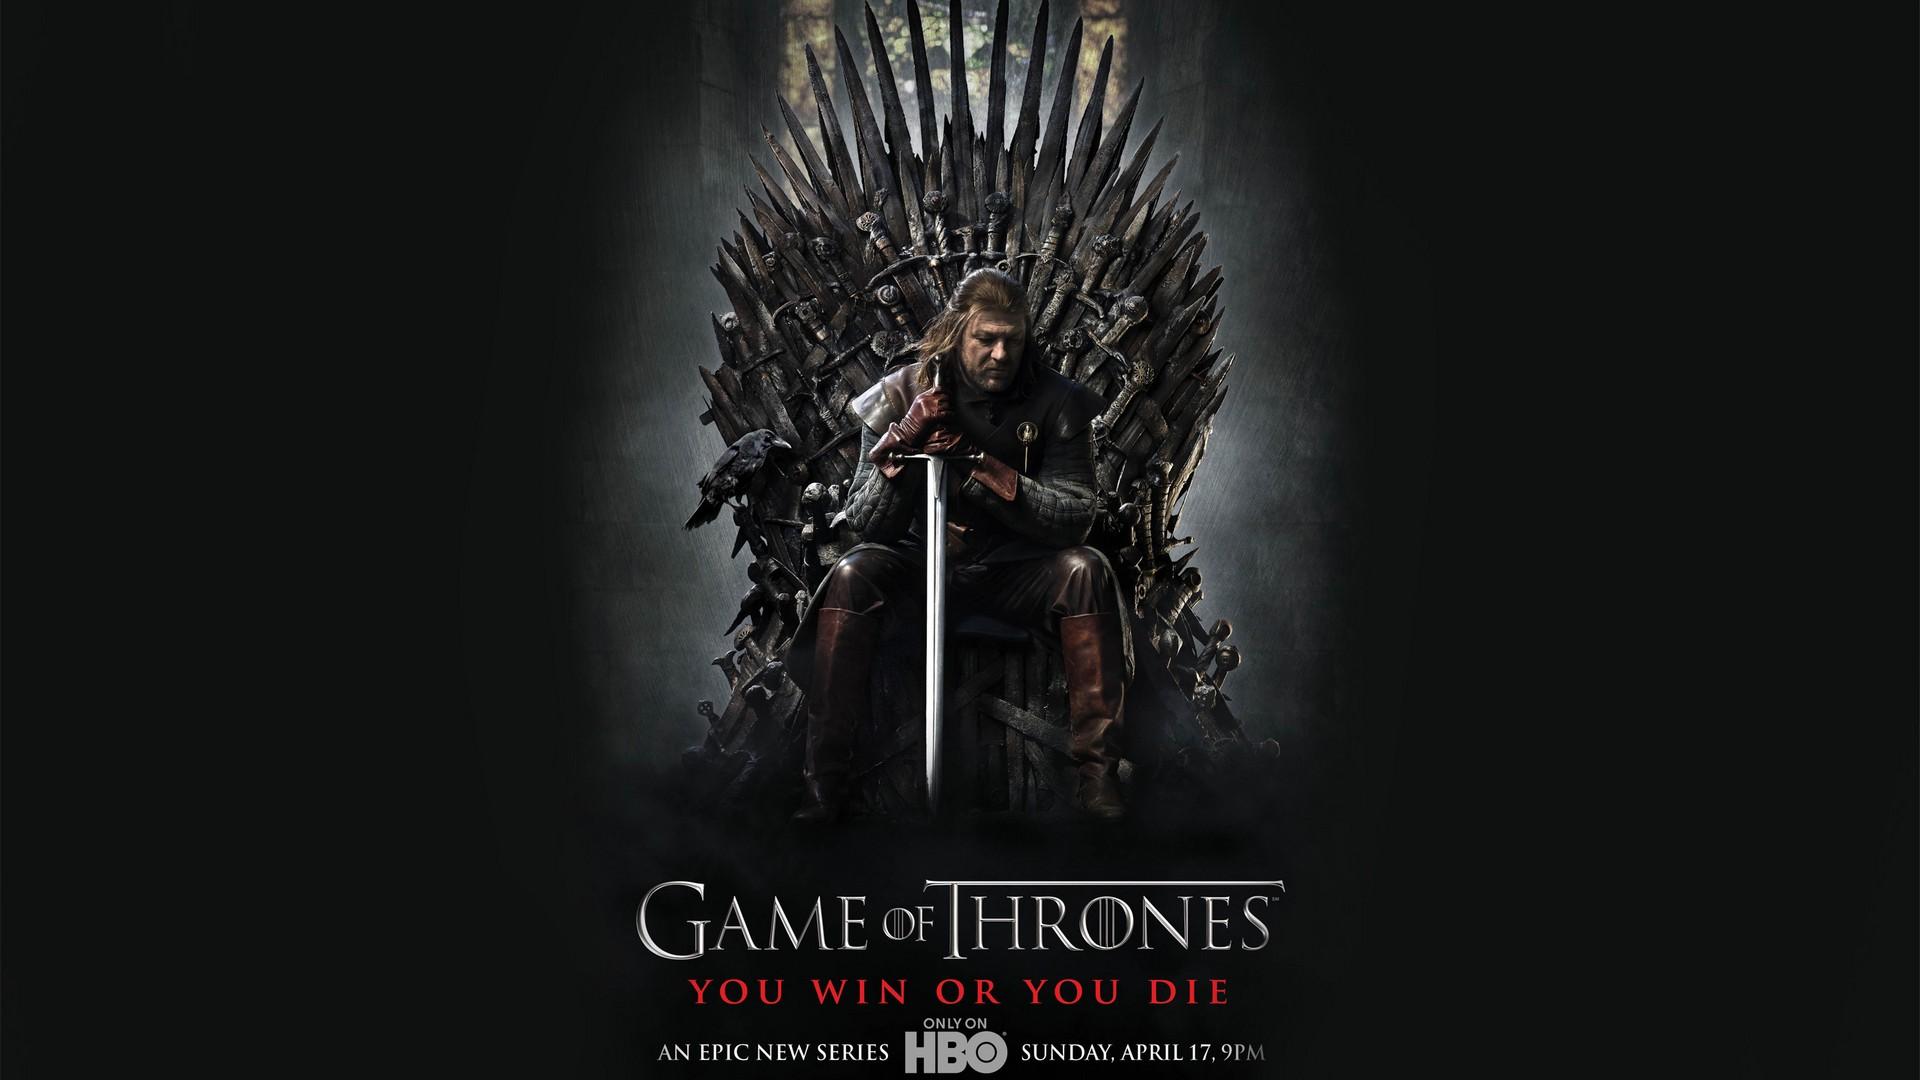 game-of-thrones_1920x1080_443-hd.jpg